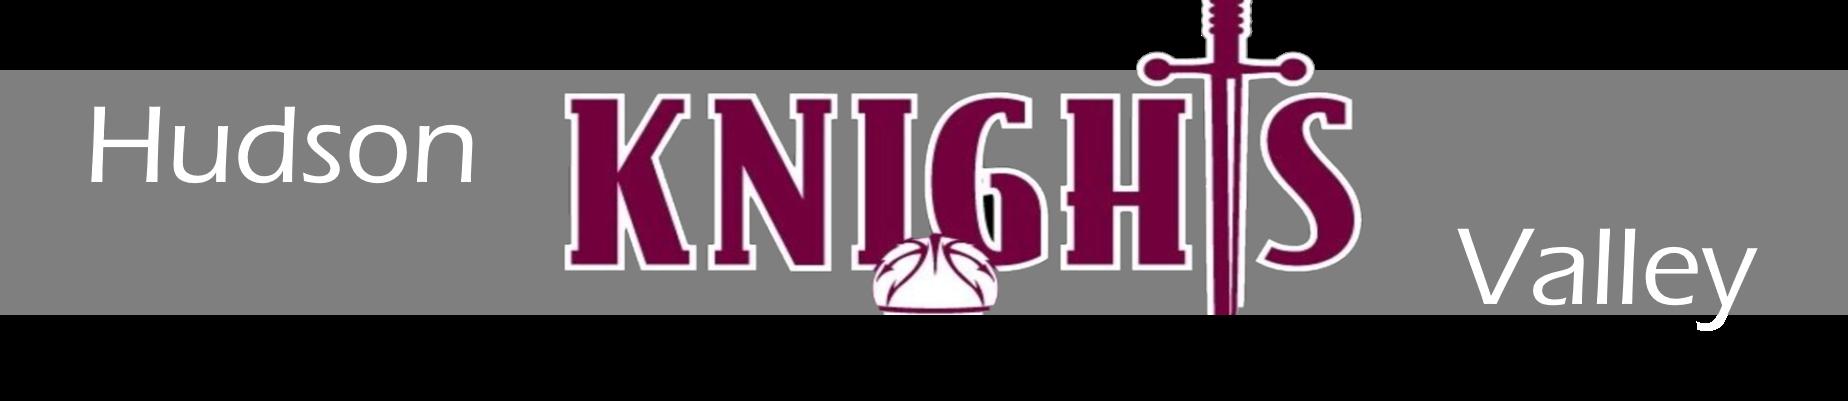 Hudson Valley Knights Basketball Club